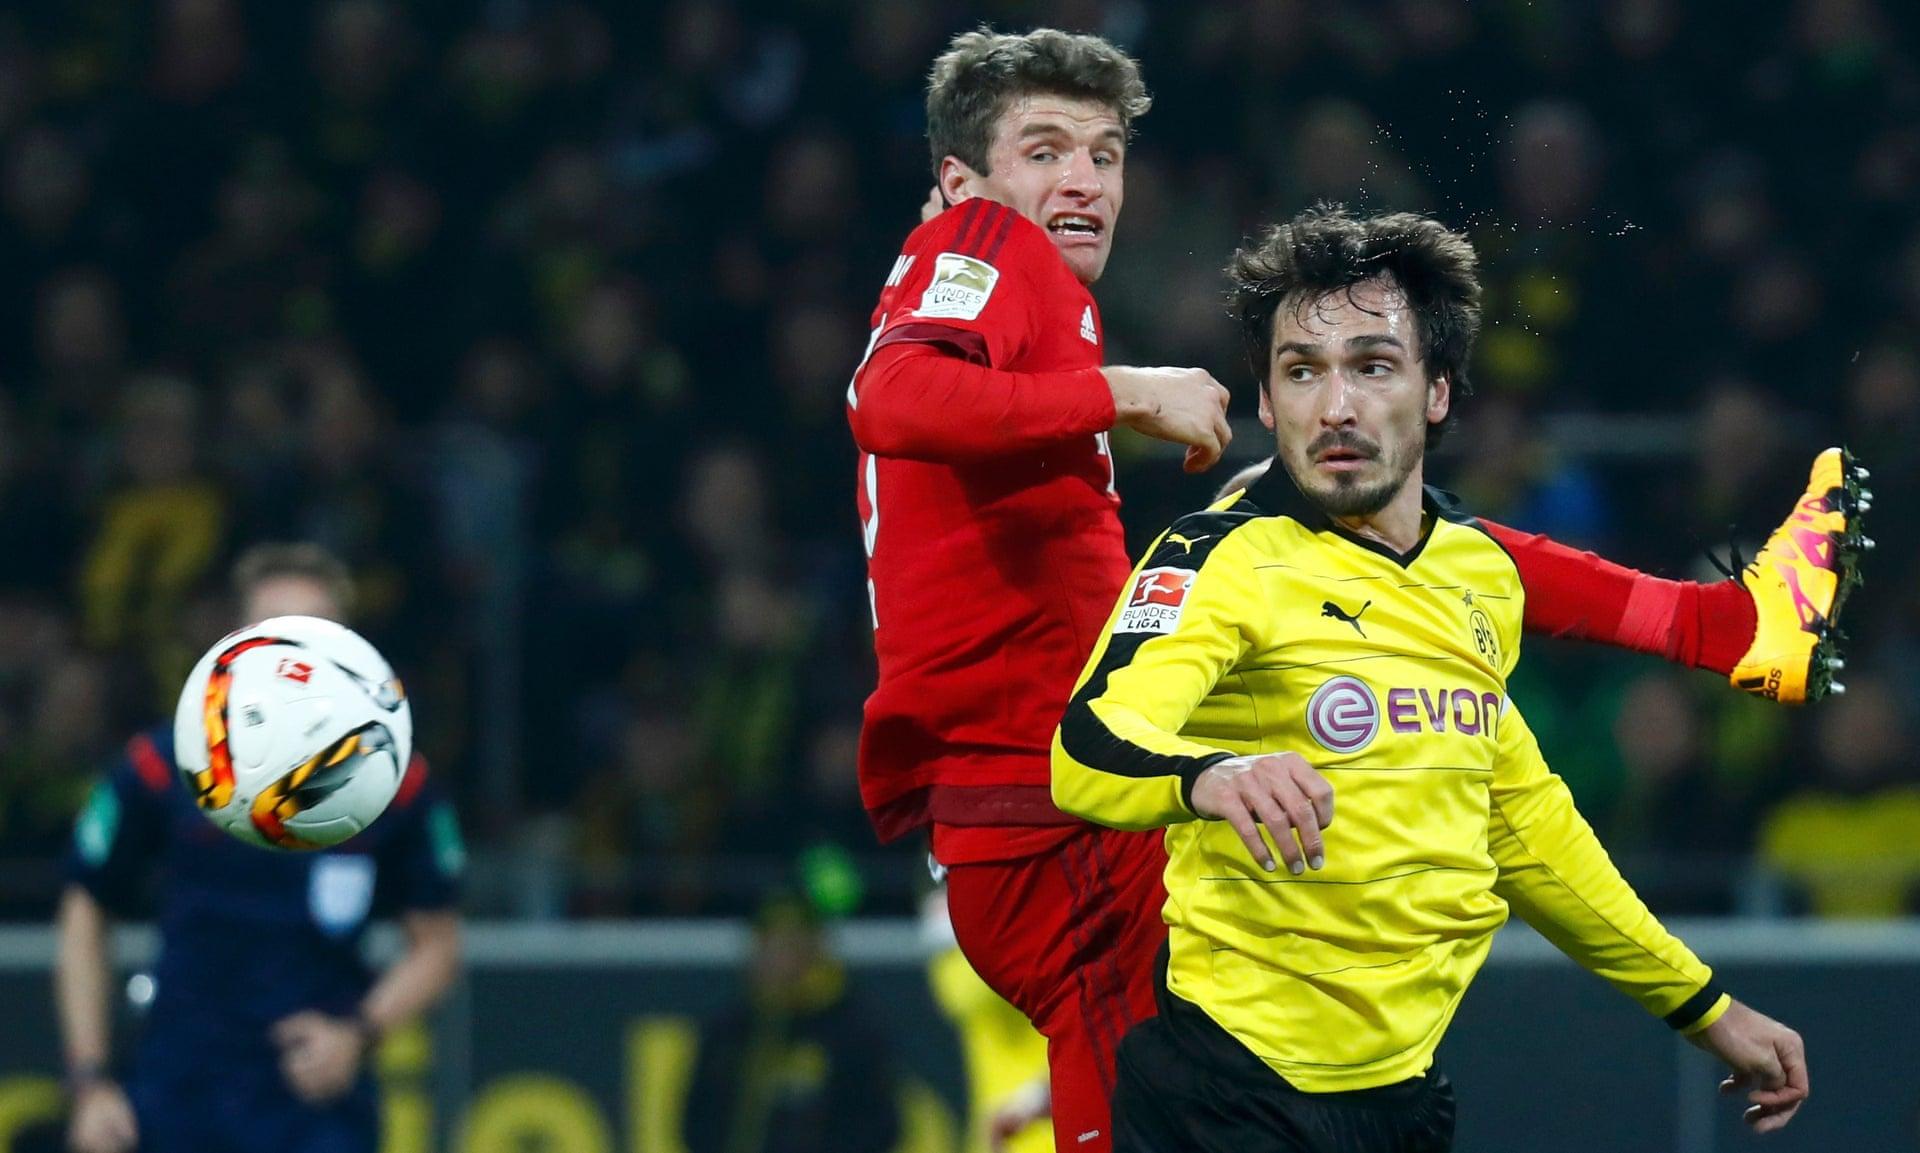 Video: Borussia Dortmund vs Bayern Munich